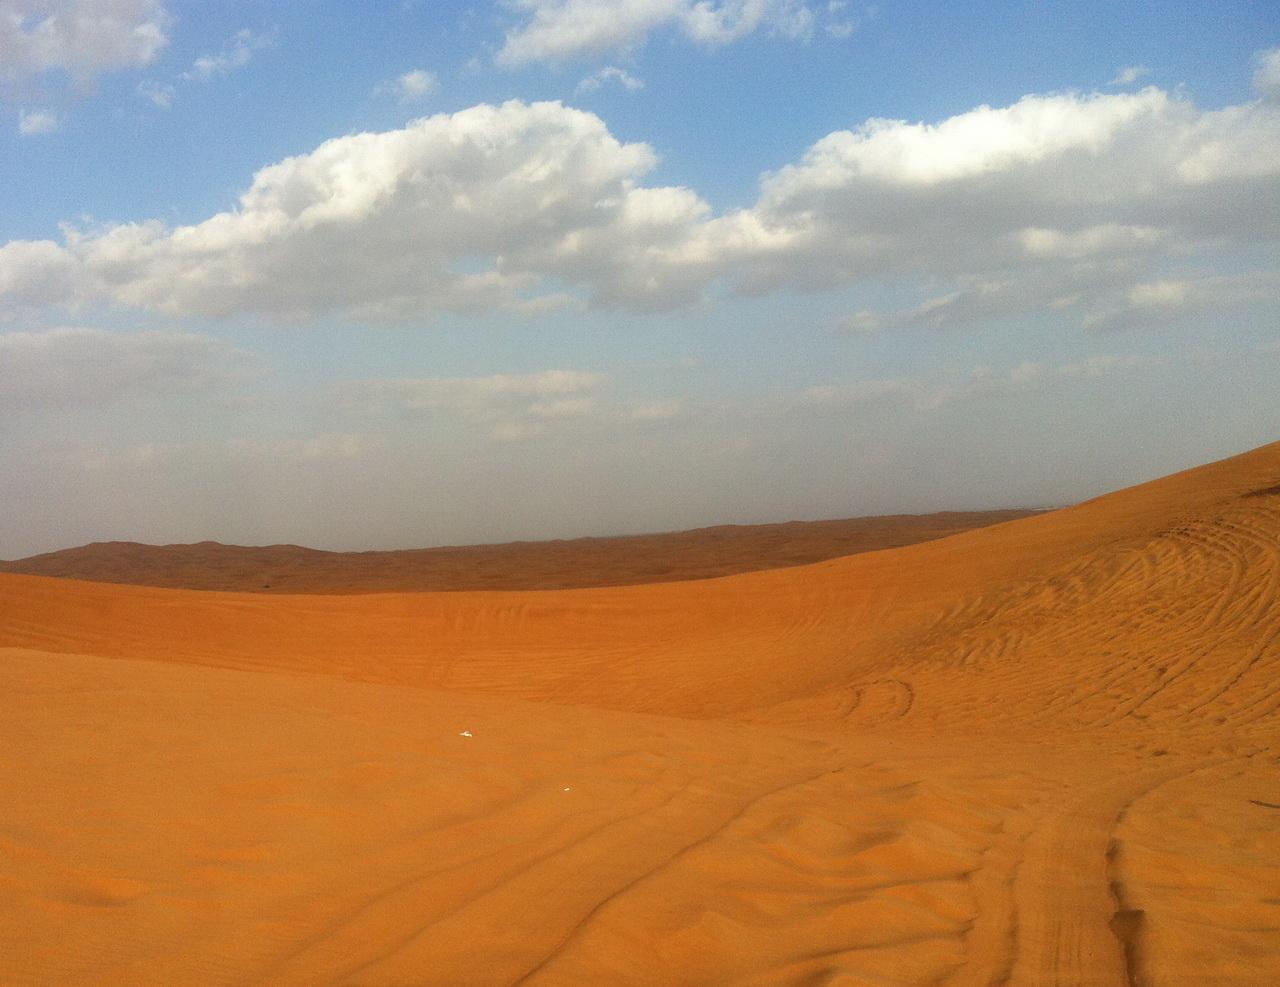 Пустыня в Дубае, ОАЭ